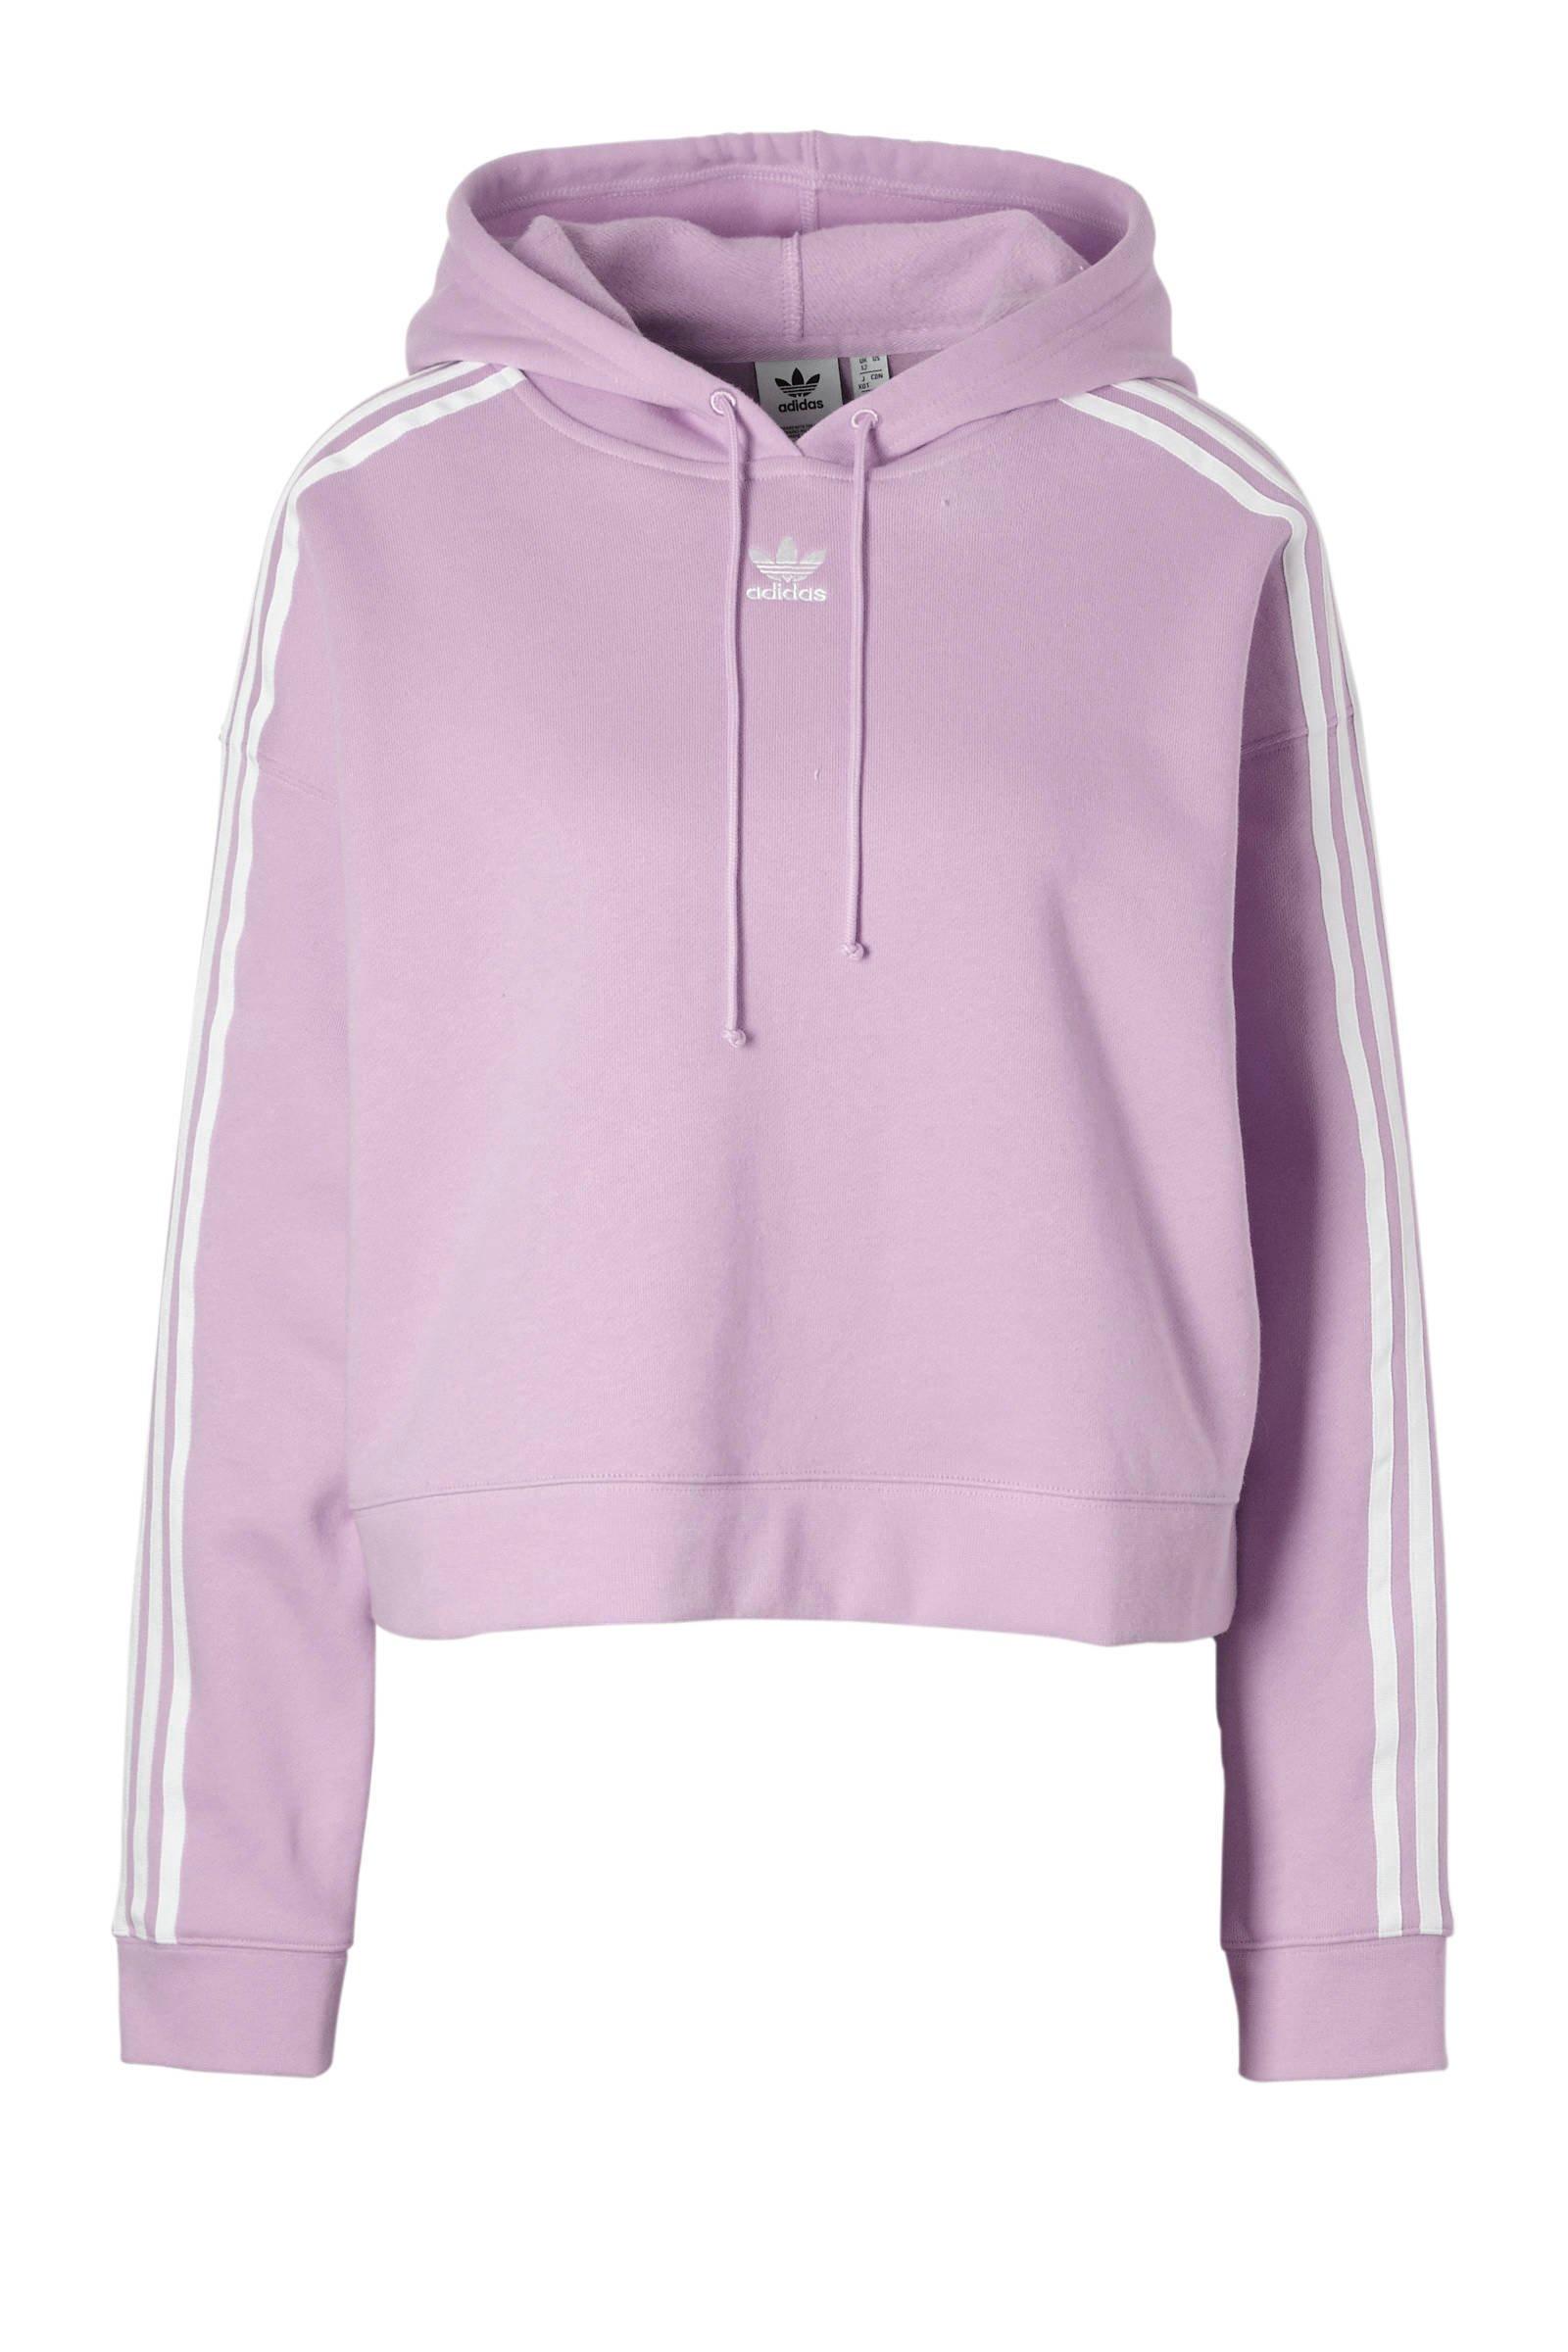 adidas Originals hoodie lila | wehkamp